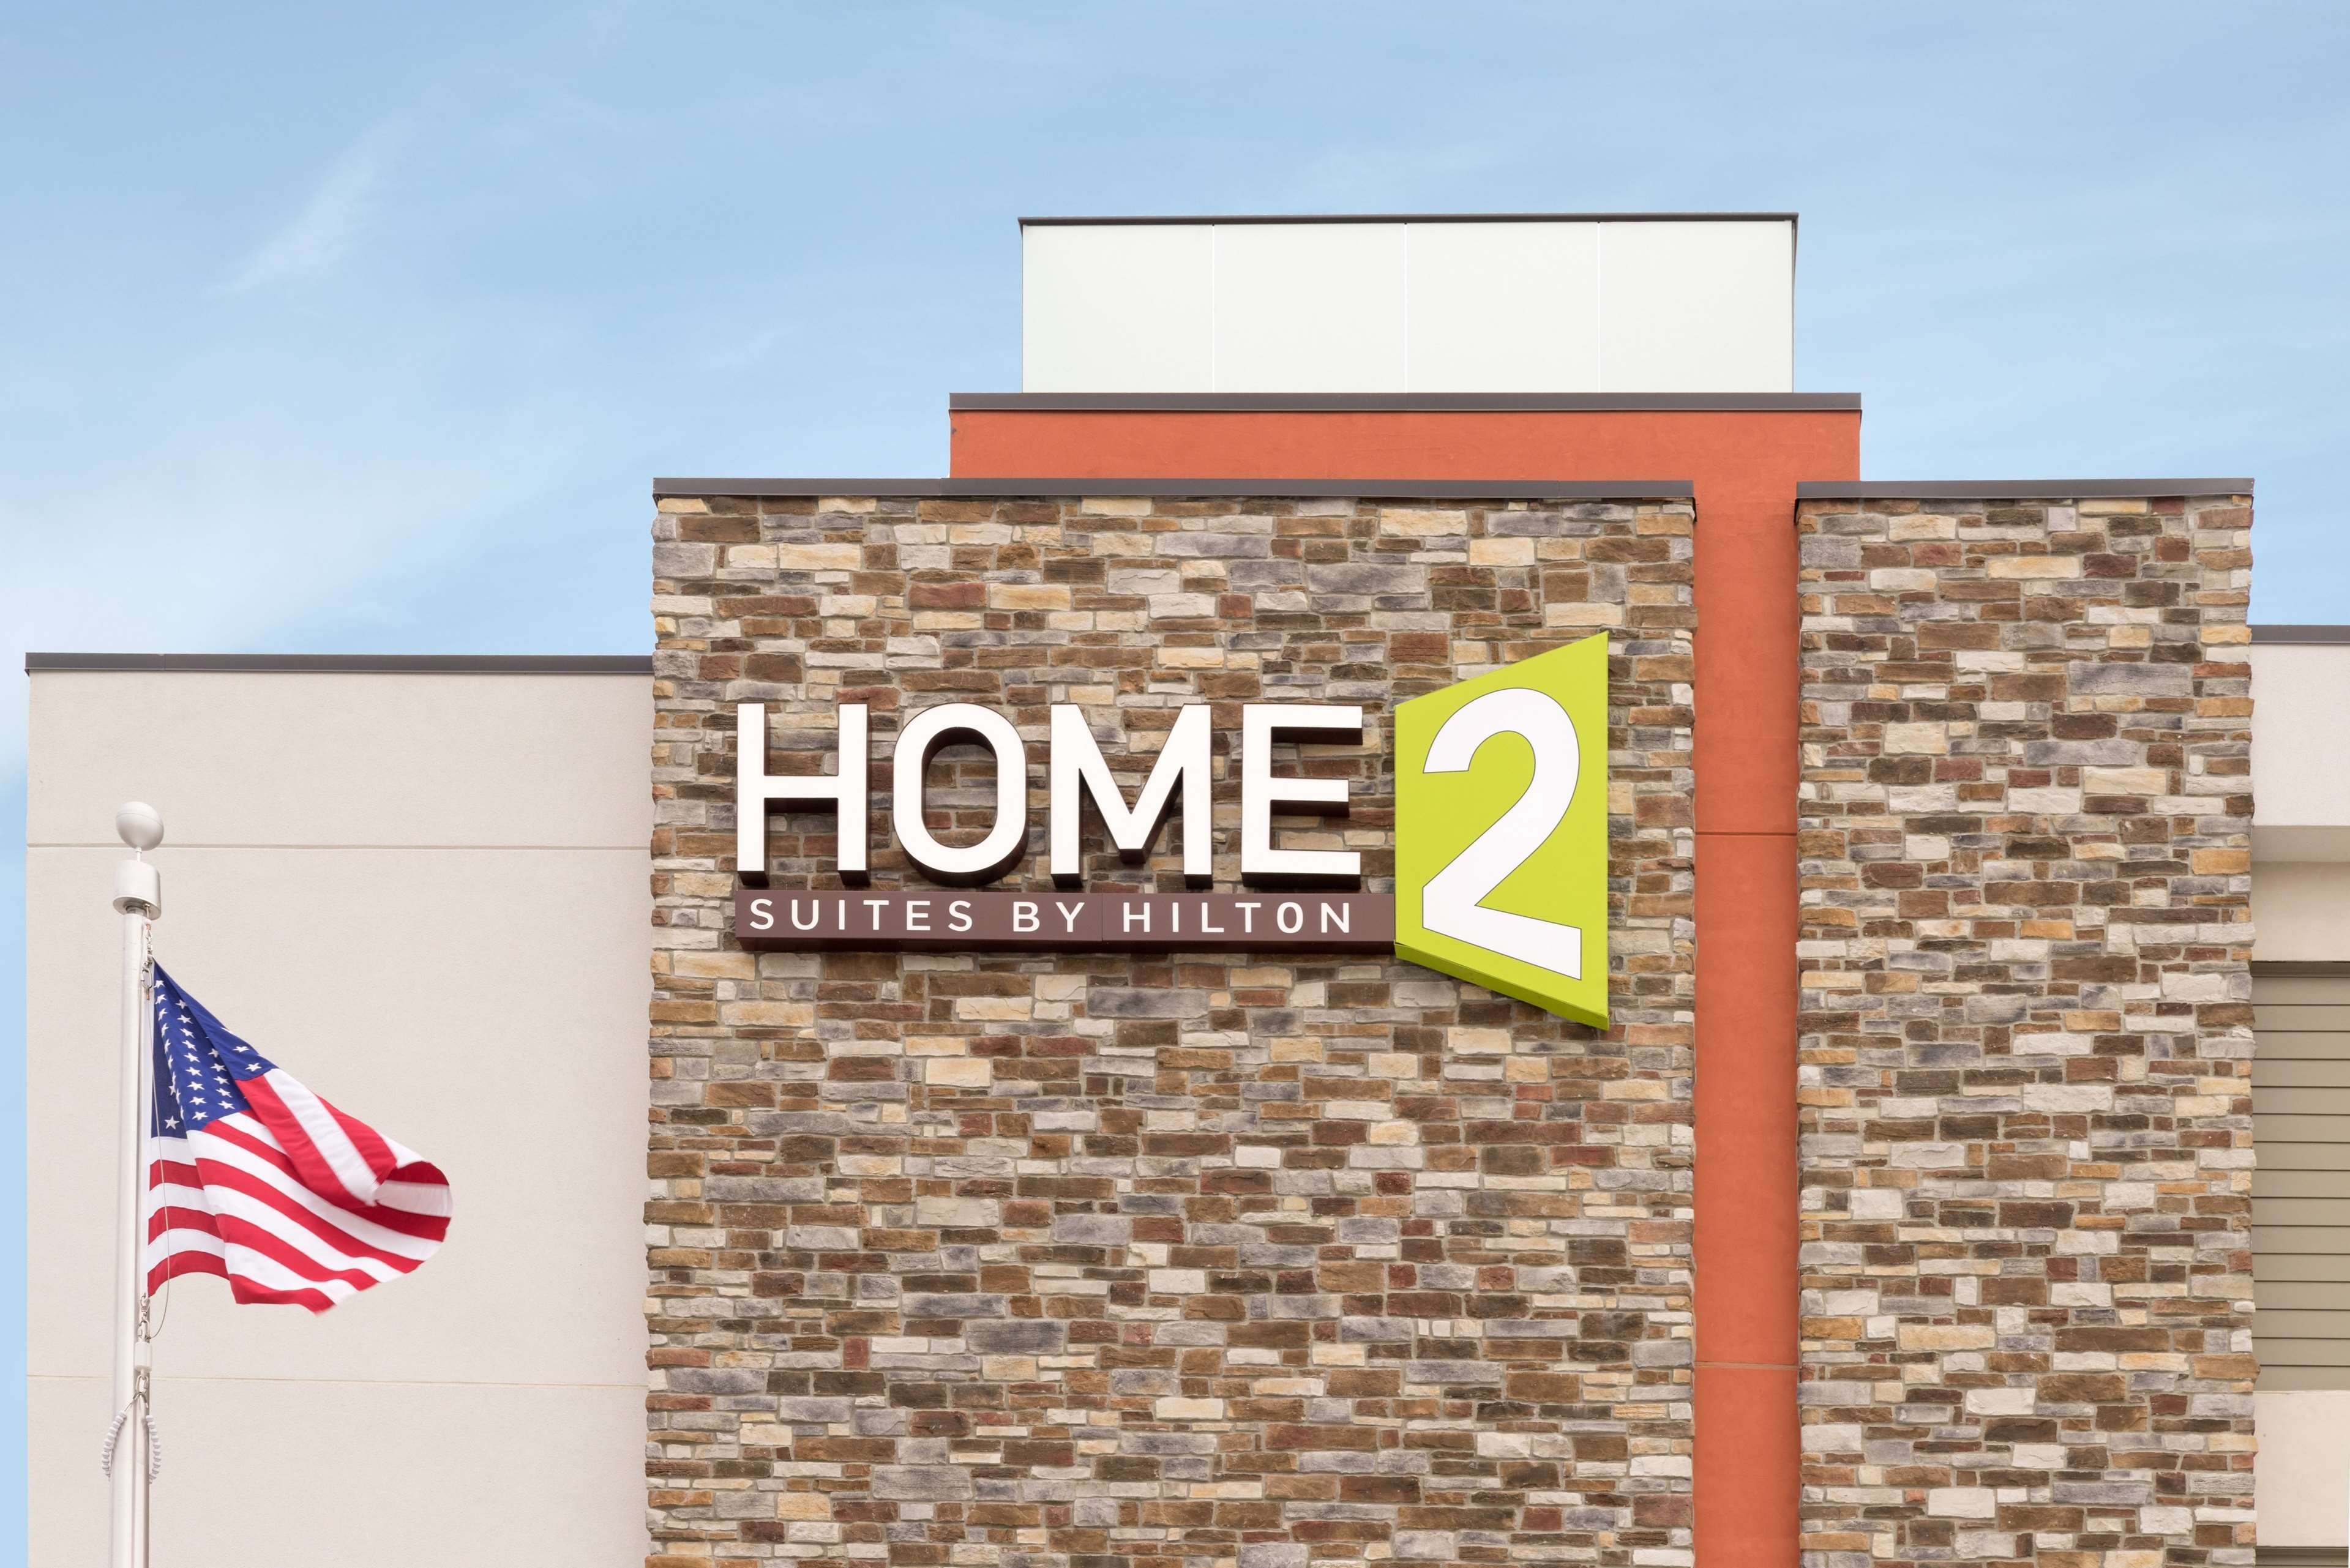 Home2 Suites by Hilton Leavenworth Downtown image 2